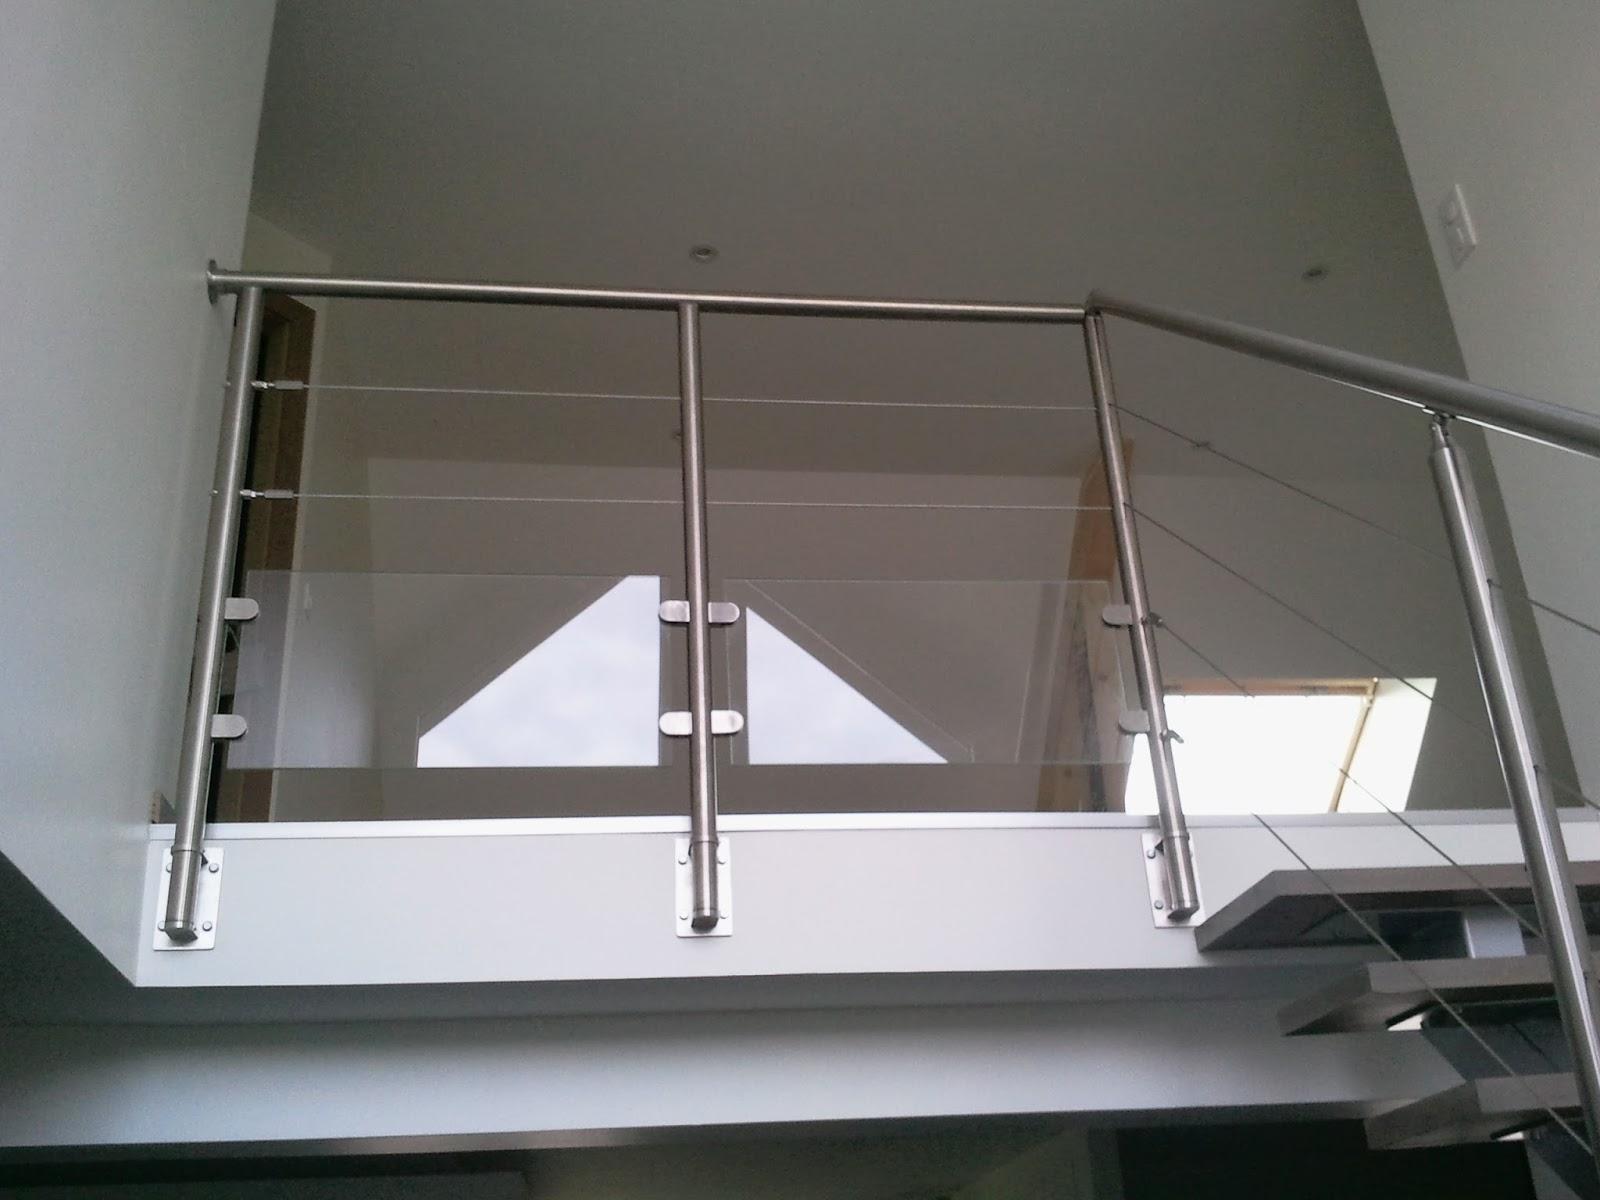 Bricolage de l 39 id e la r alisation un escalier design et contemporain - Construire garde corps ...